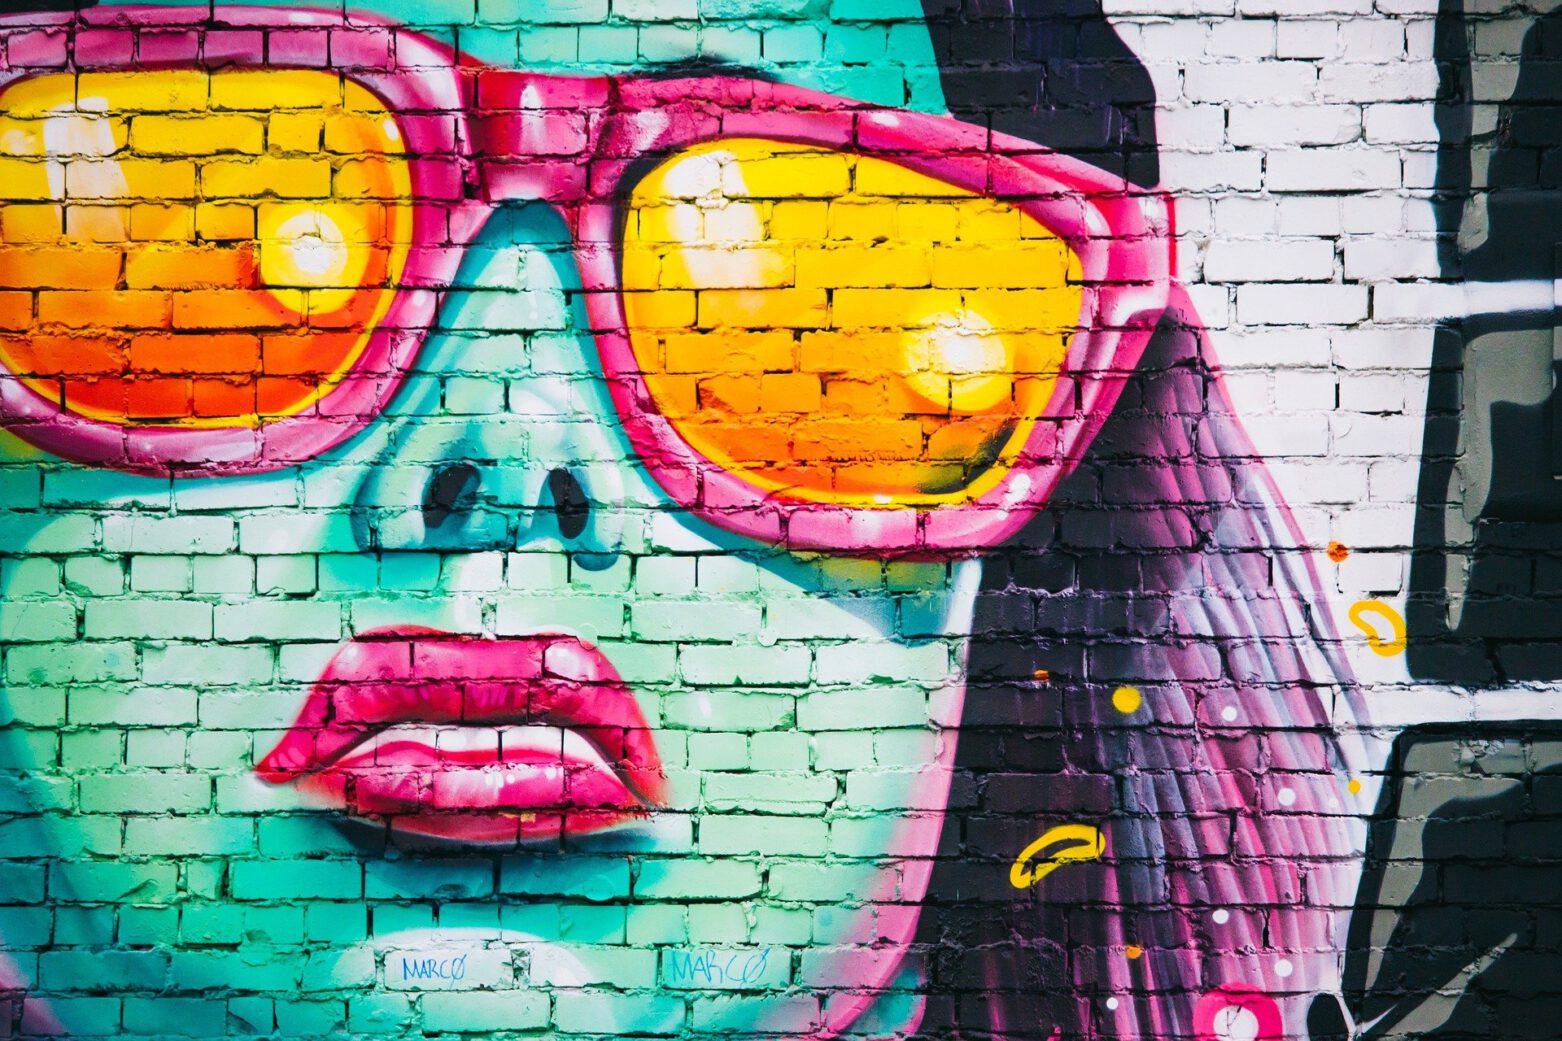 Kreatives Malen im Graffiti-Style